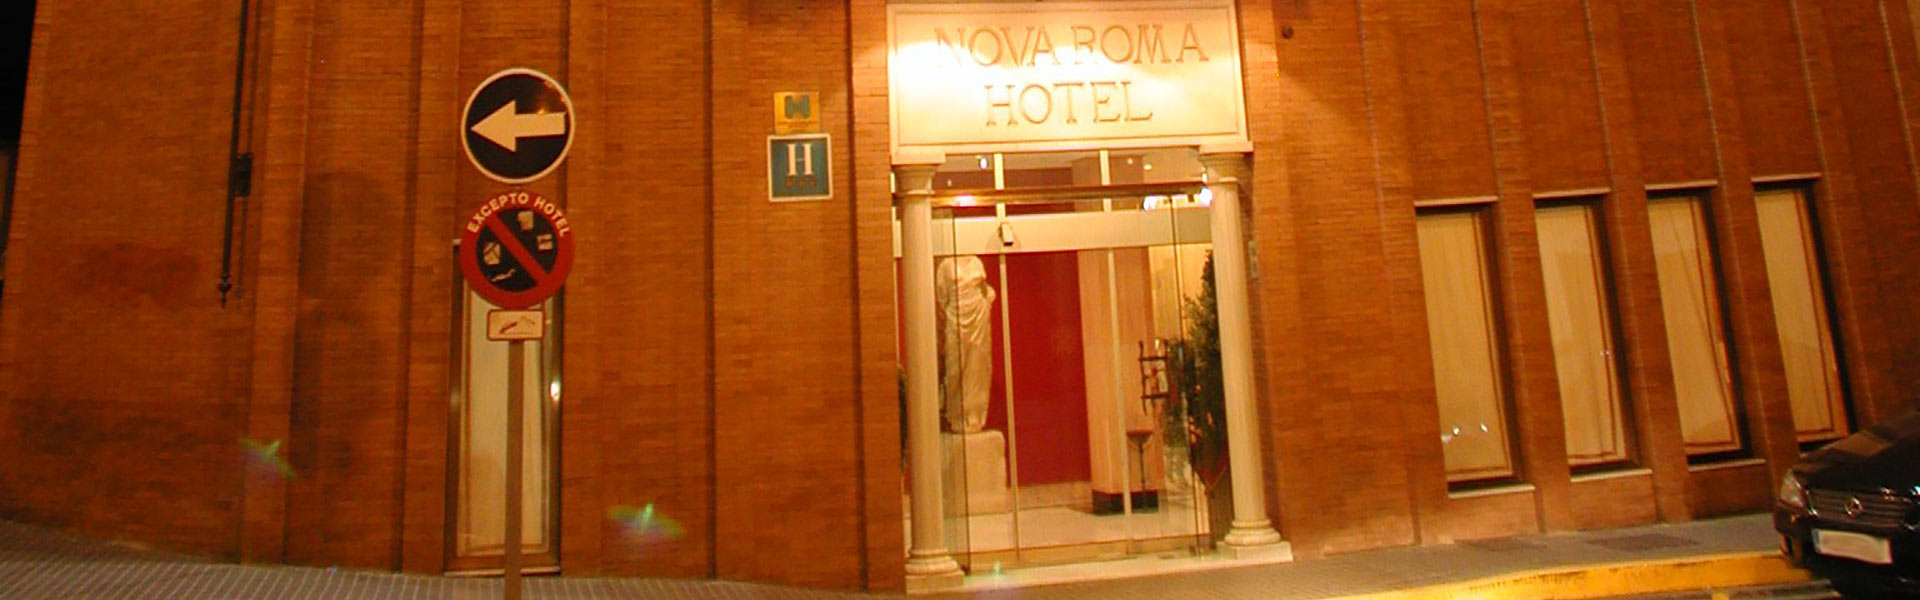 hoteles en mérida